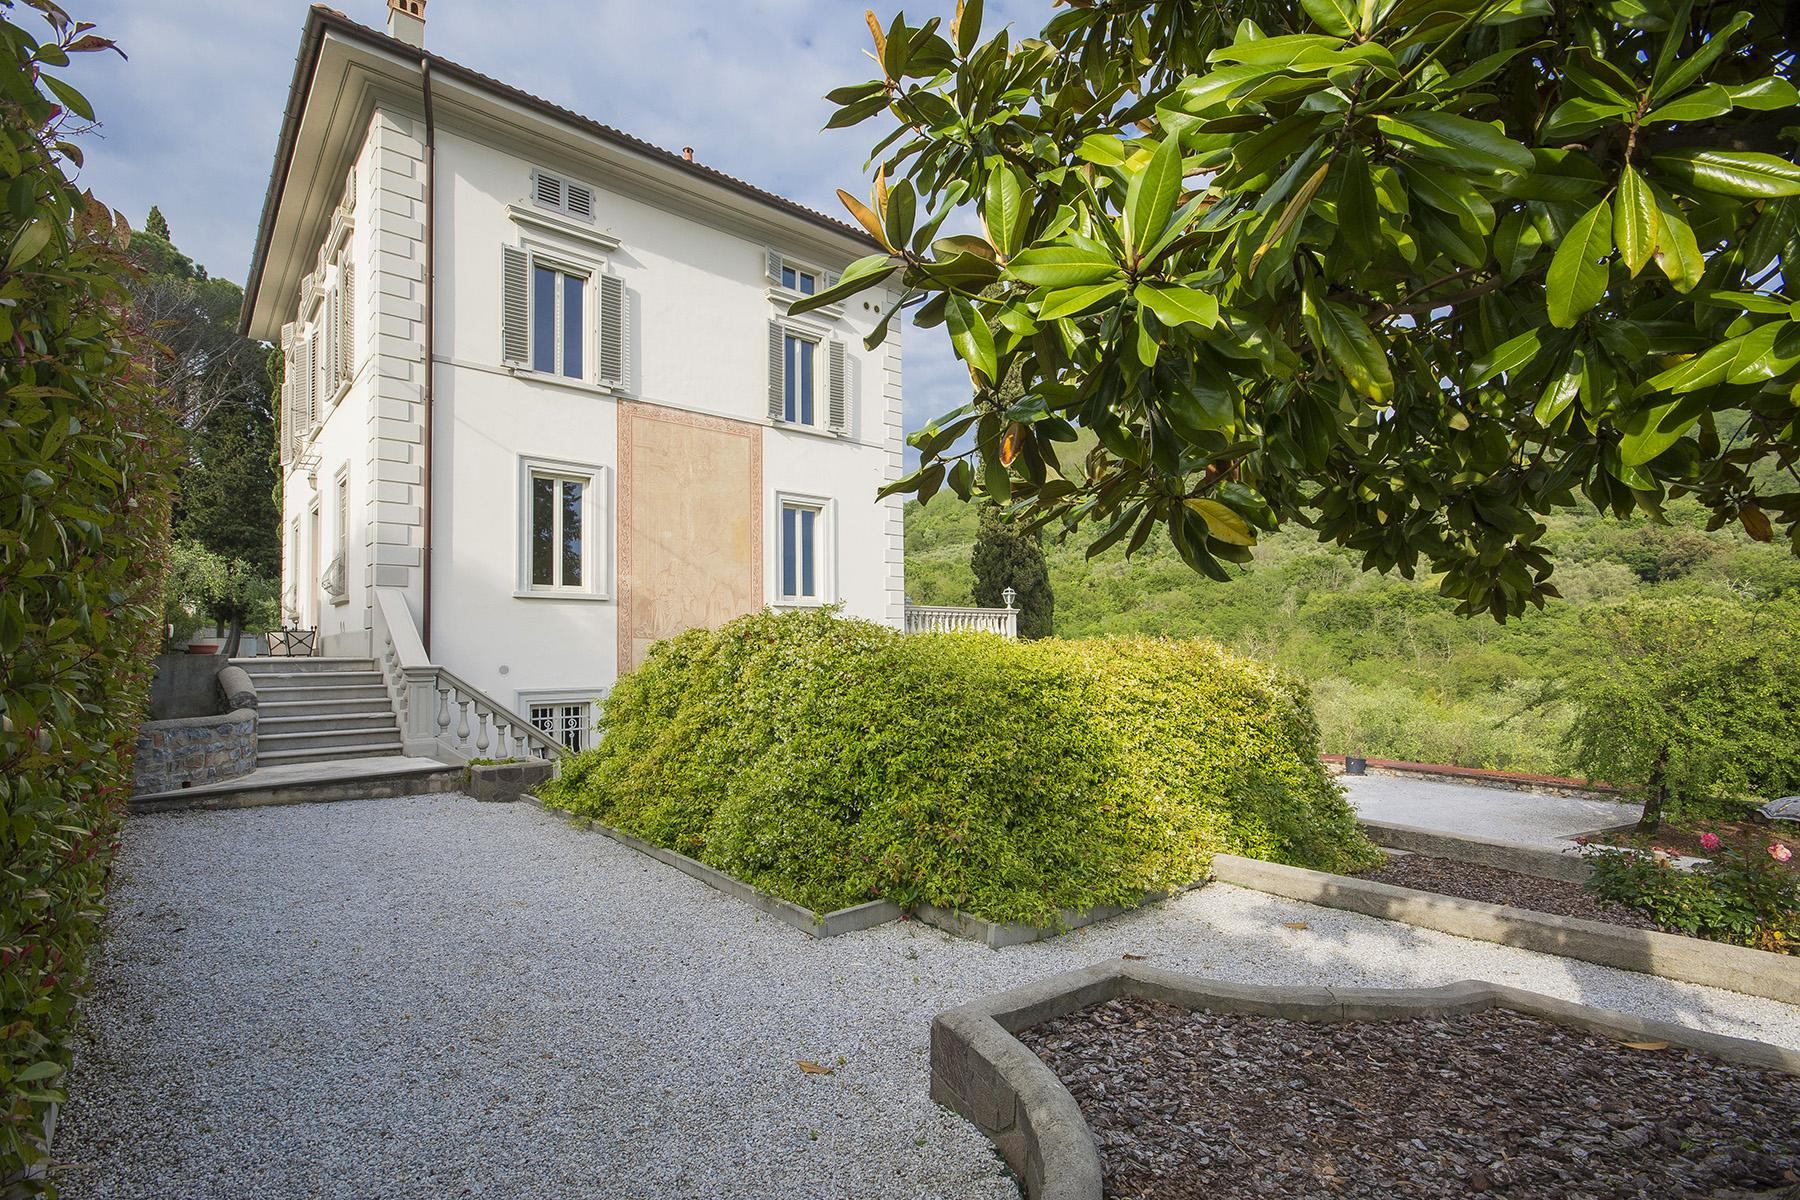 Montecatini Terme小镇优雅的新艺术风格的别墅 - 36